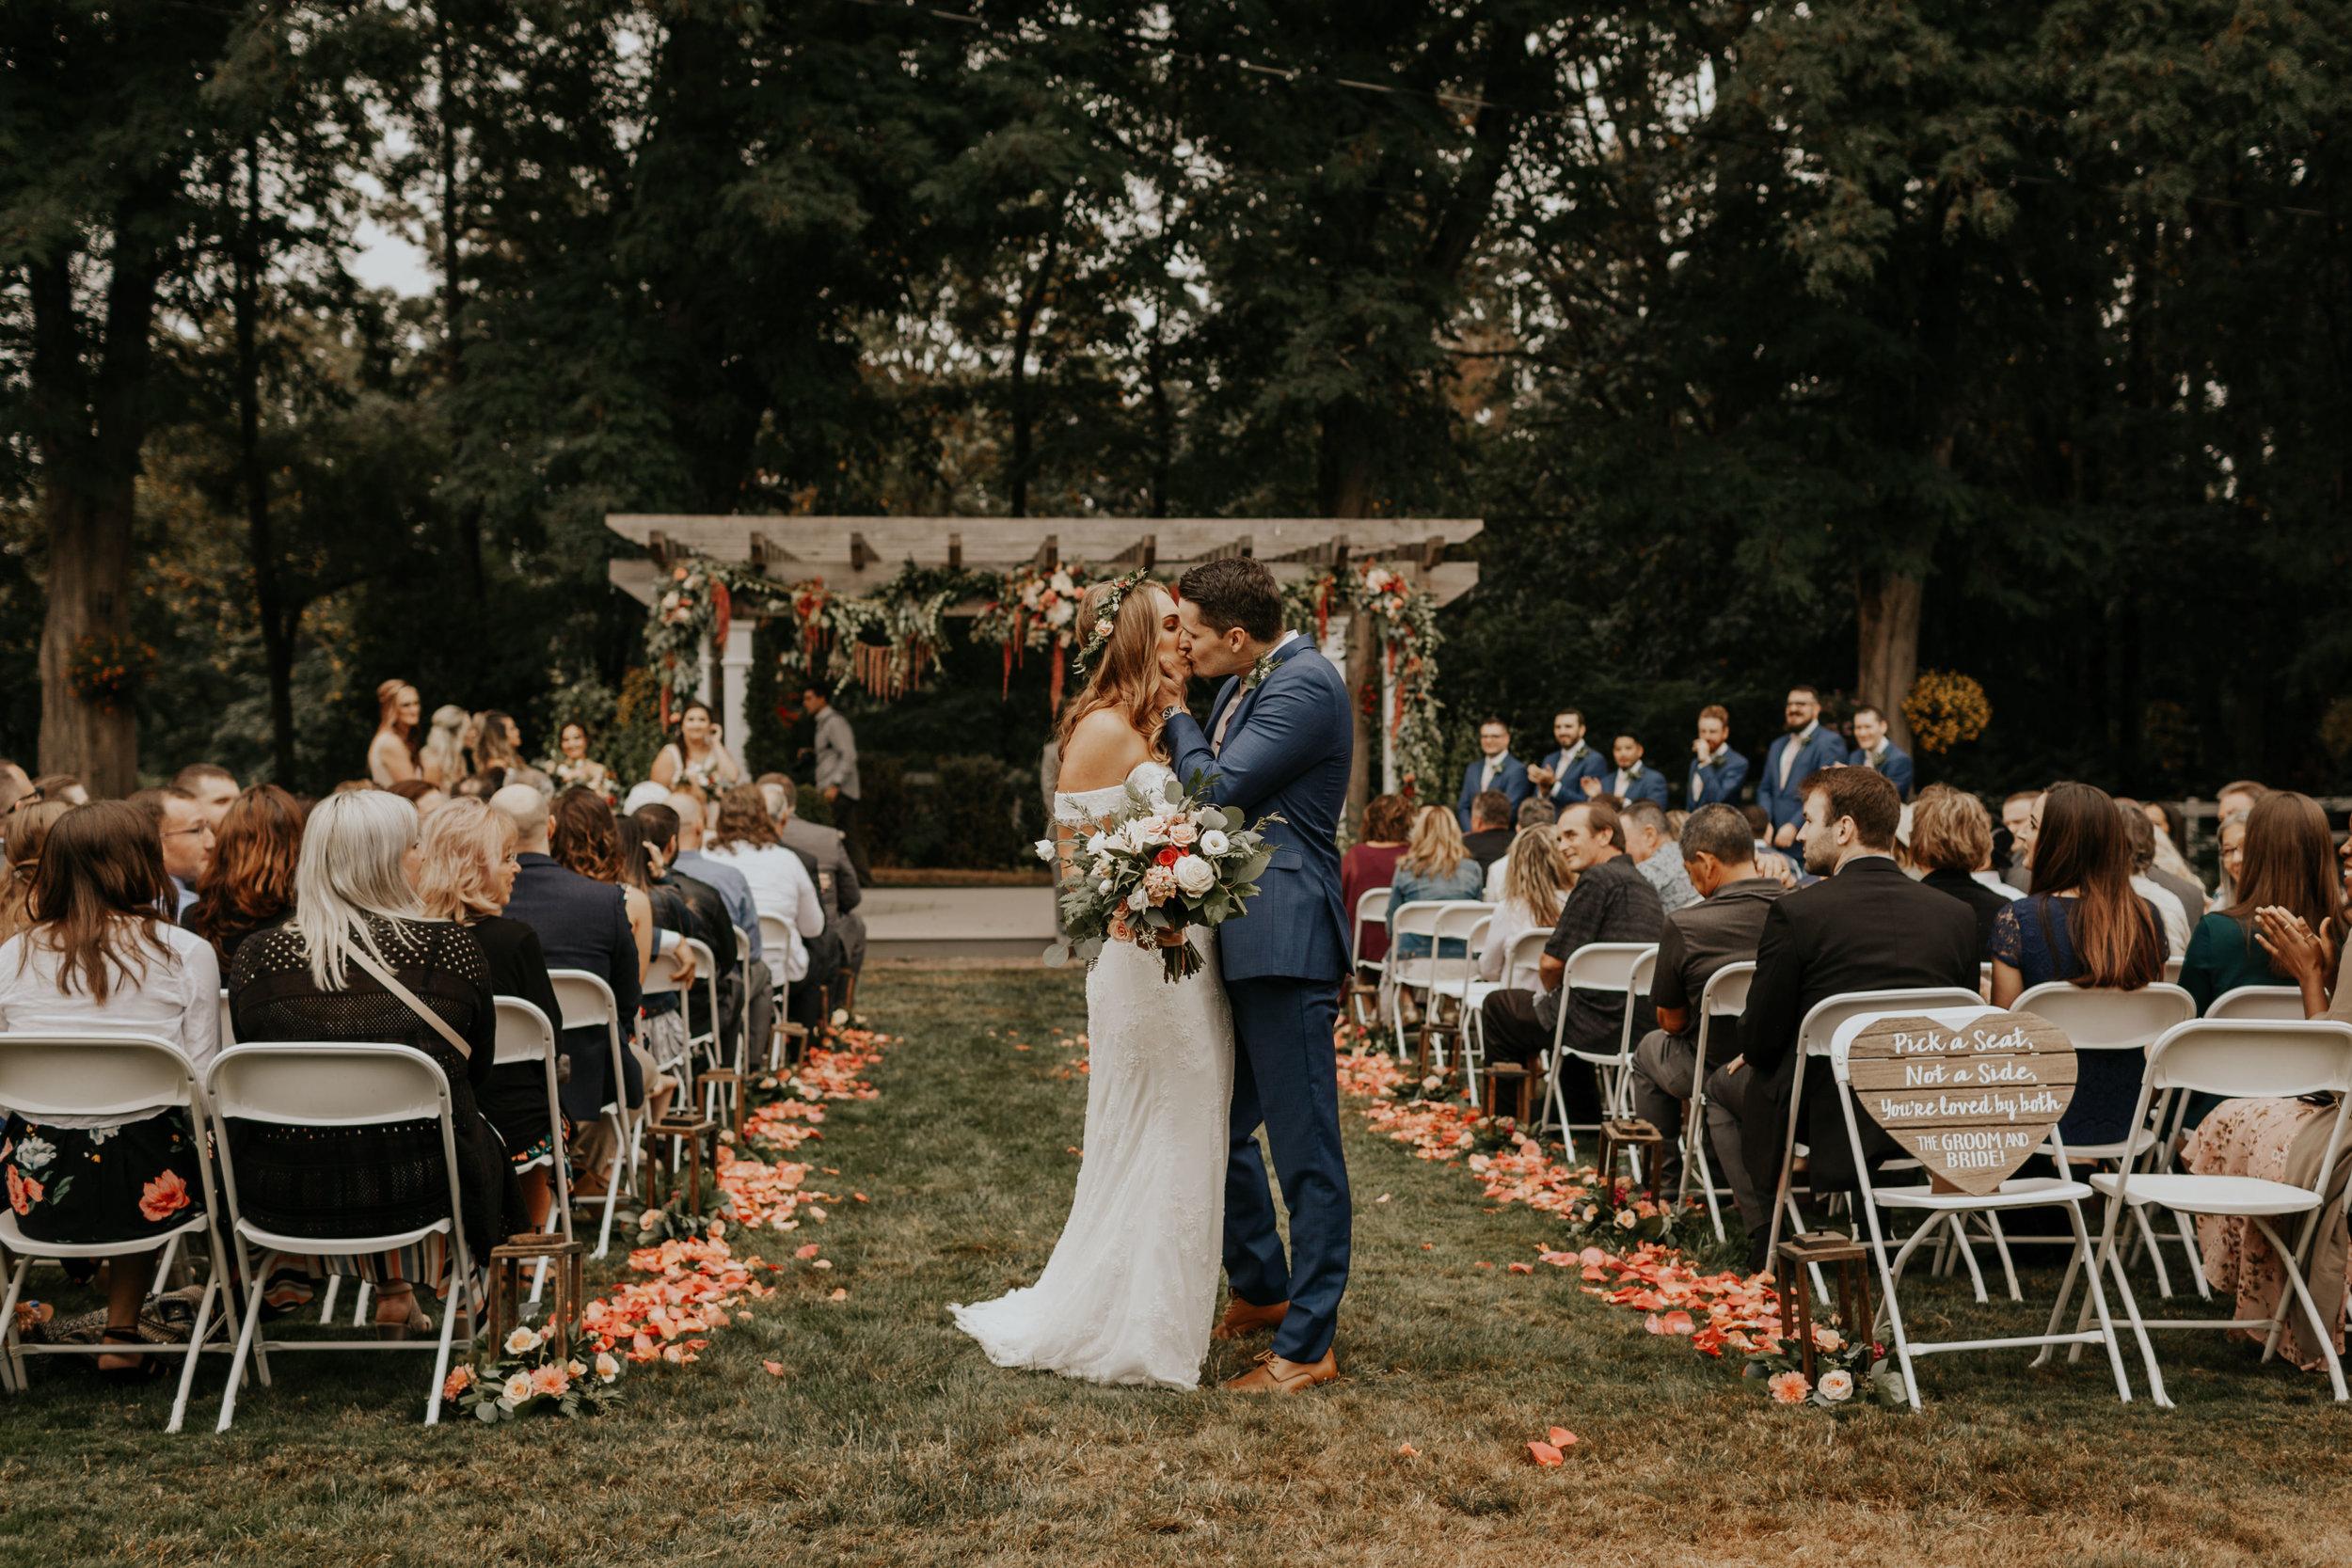 ginapaulson_jakitrevor_wedding-649.jpg